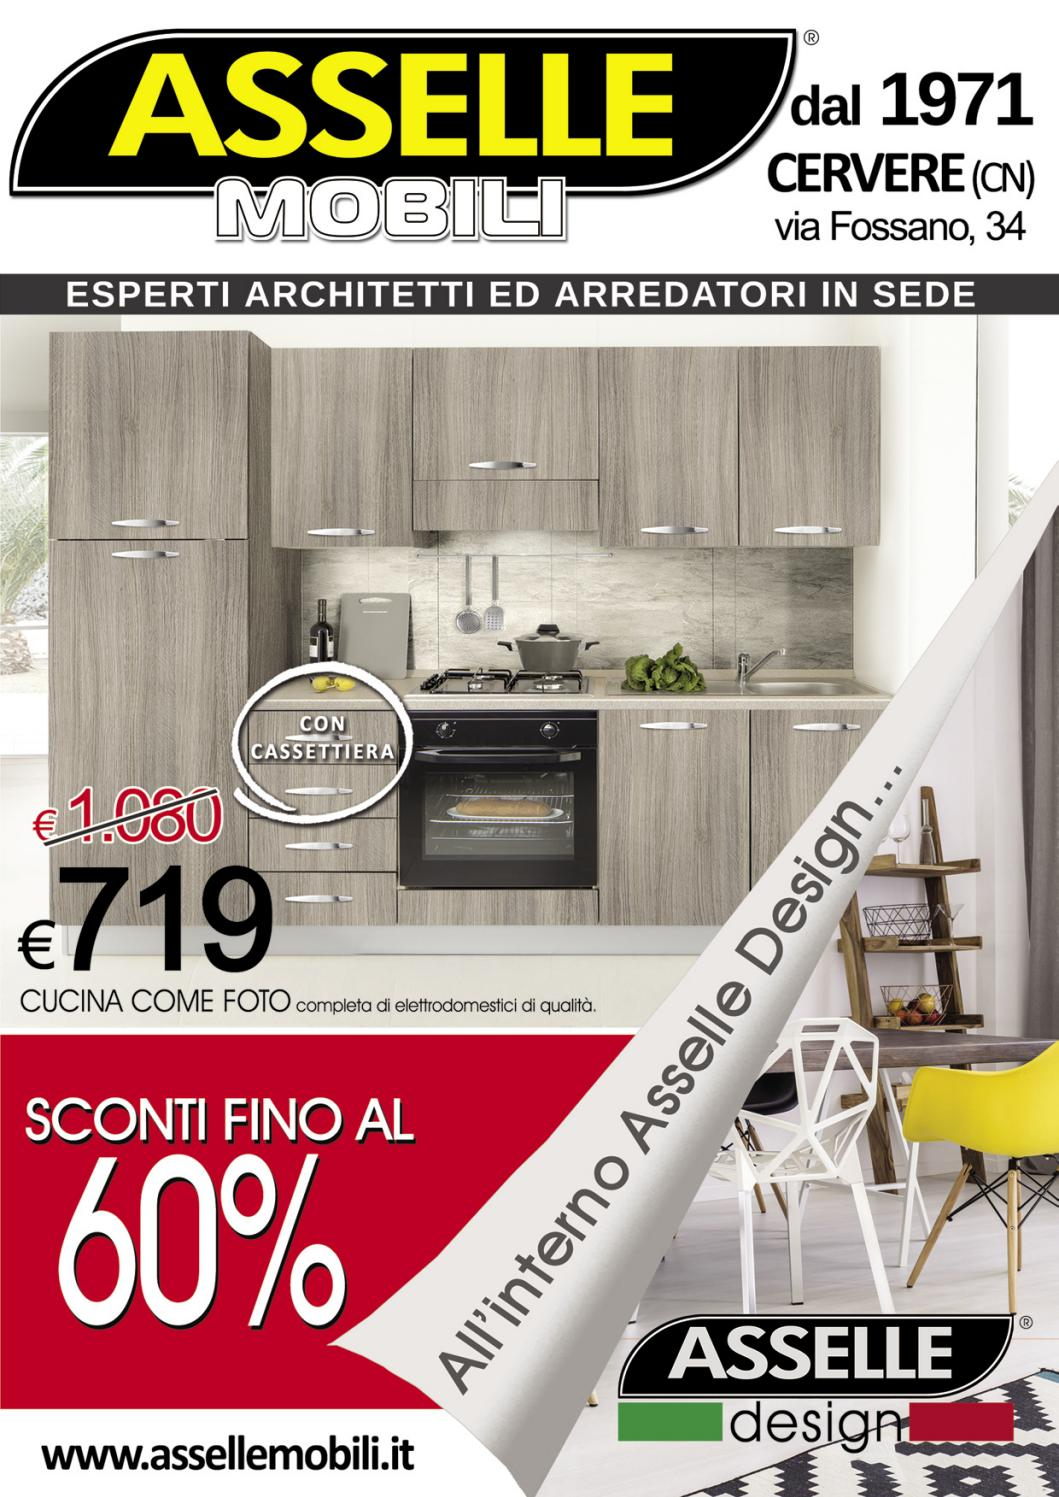 Asselle mobili catalogo offerte 2017 by asselle mobili issuu - Asselle mobili cucine ...